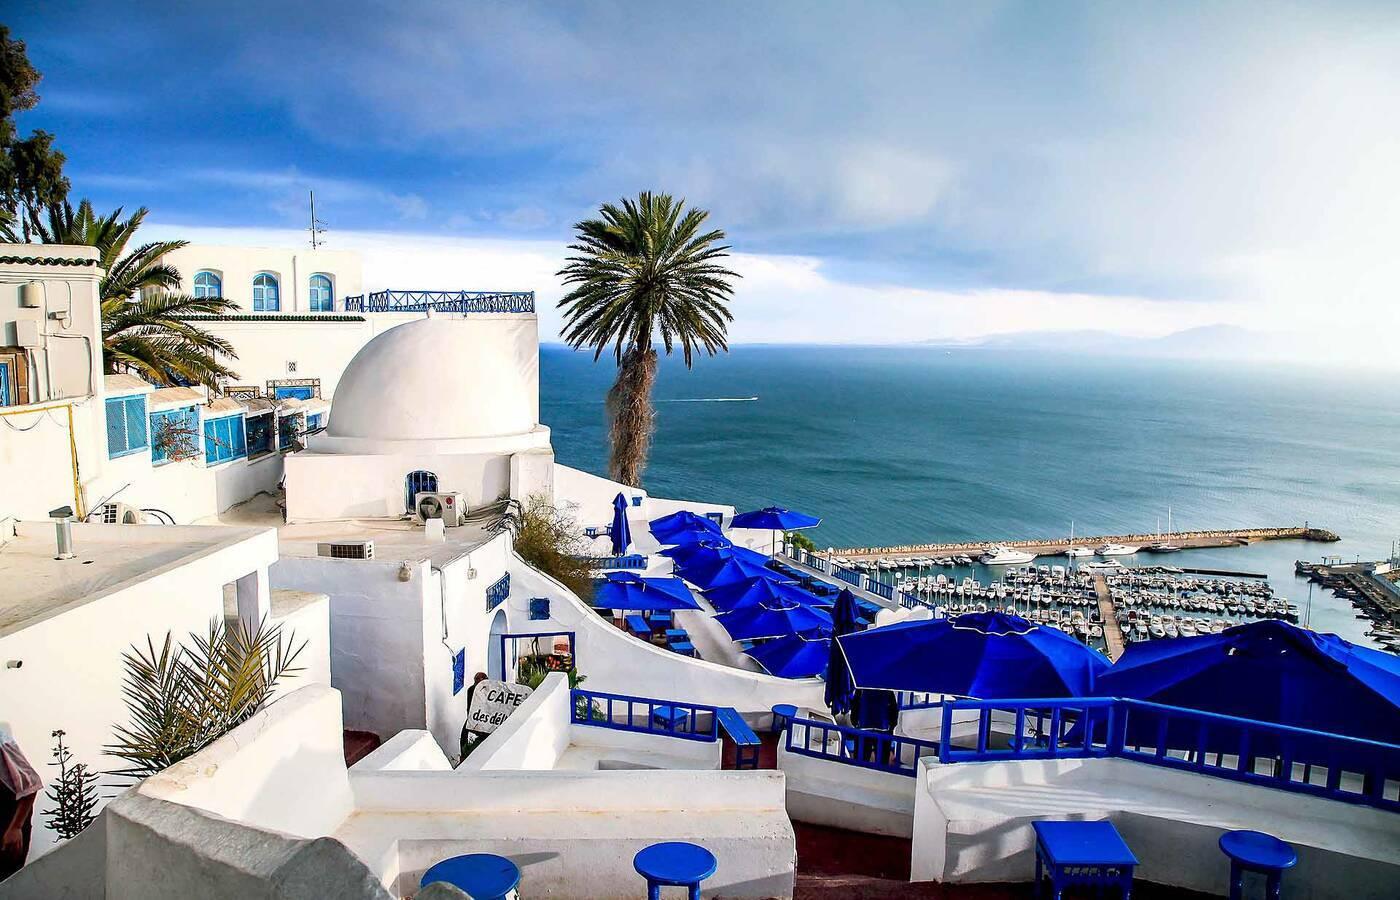 gratuit datant Tunisie Nellore sites de rencontre